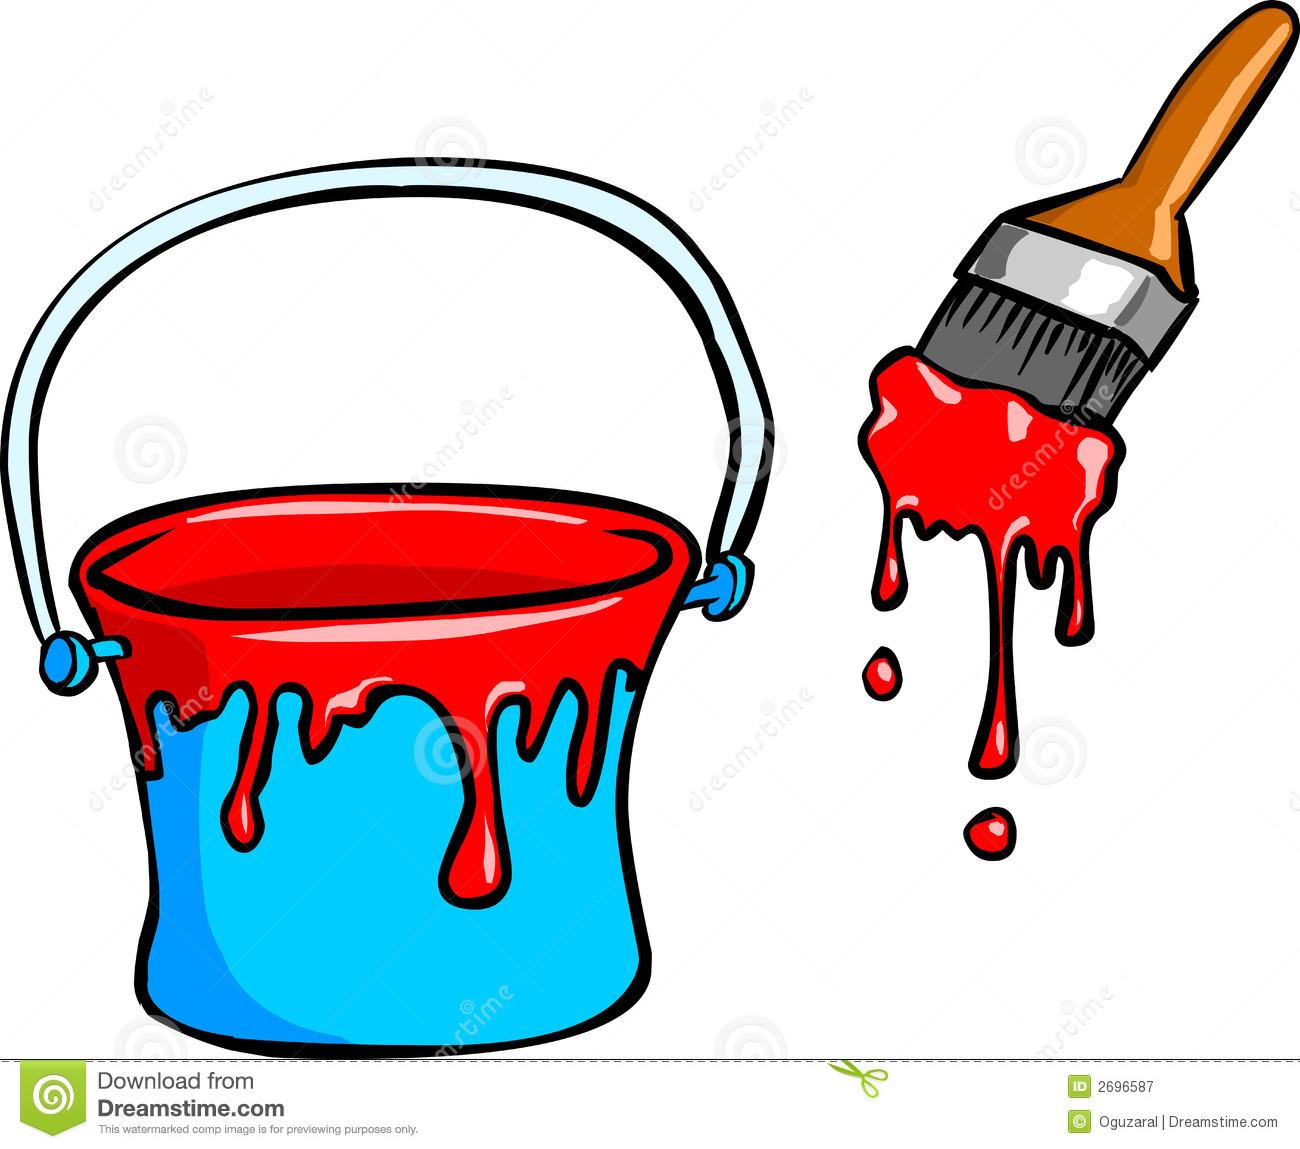 paintbucketclipartblackandwhitepaintbucketbrush2696587.jpg